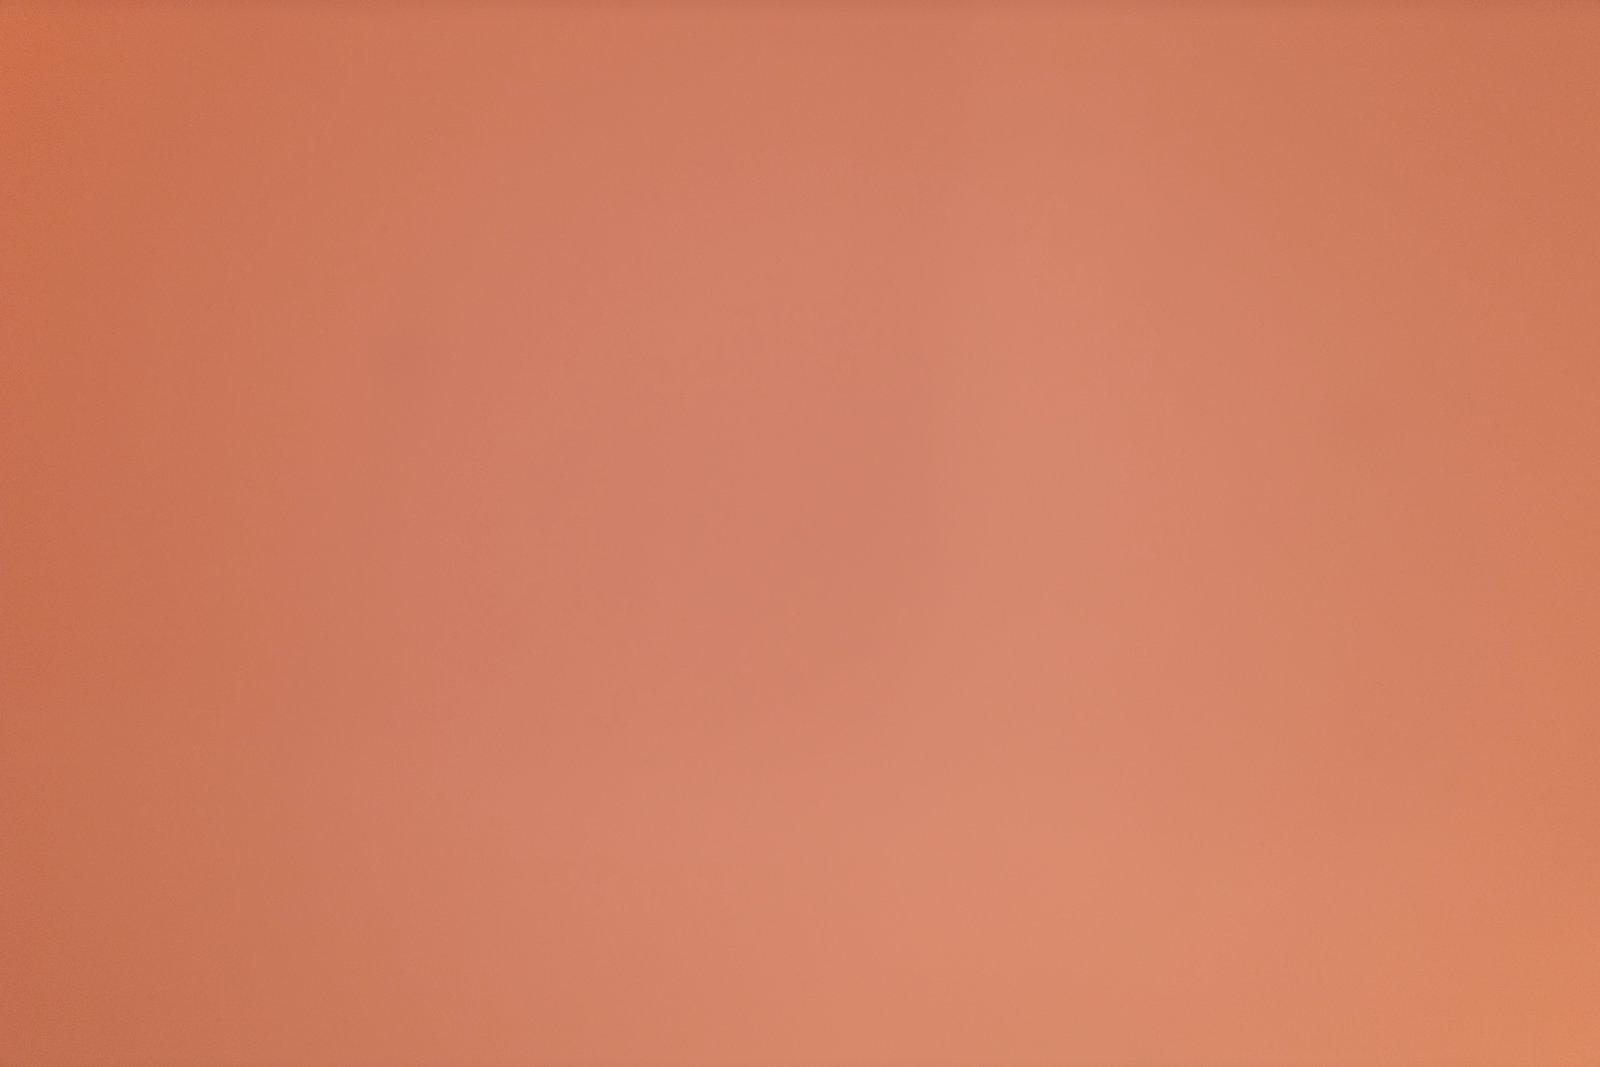 test infrarouge HOTSPOT 24mm F1.4 SIGMA | Pierre-Louis Ferrer | Test du SIGMA 24mm F/1.4 DG HSM Art en photographie infrarouge | Partie 1